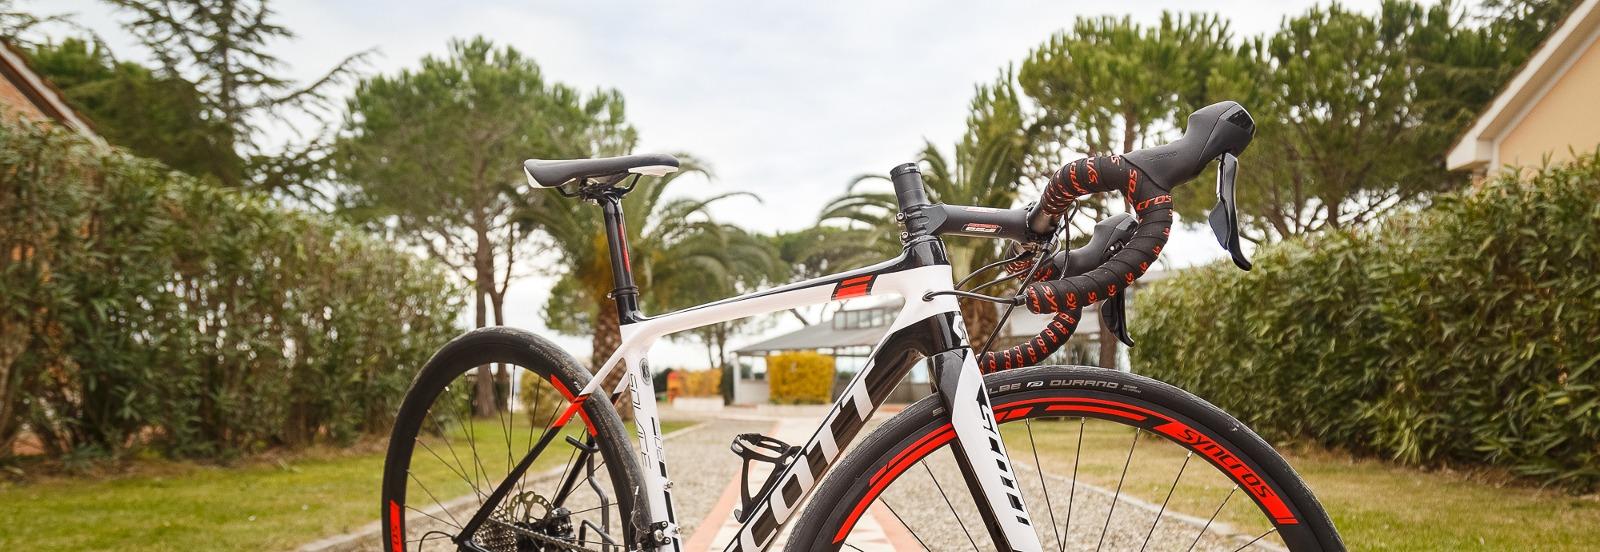 itinerari bici Maremma Toscana